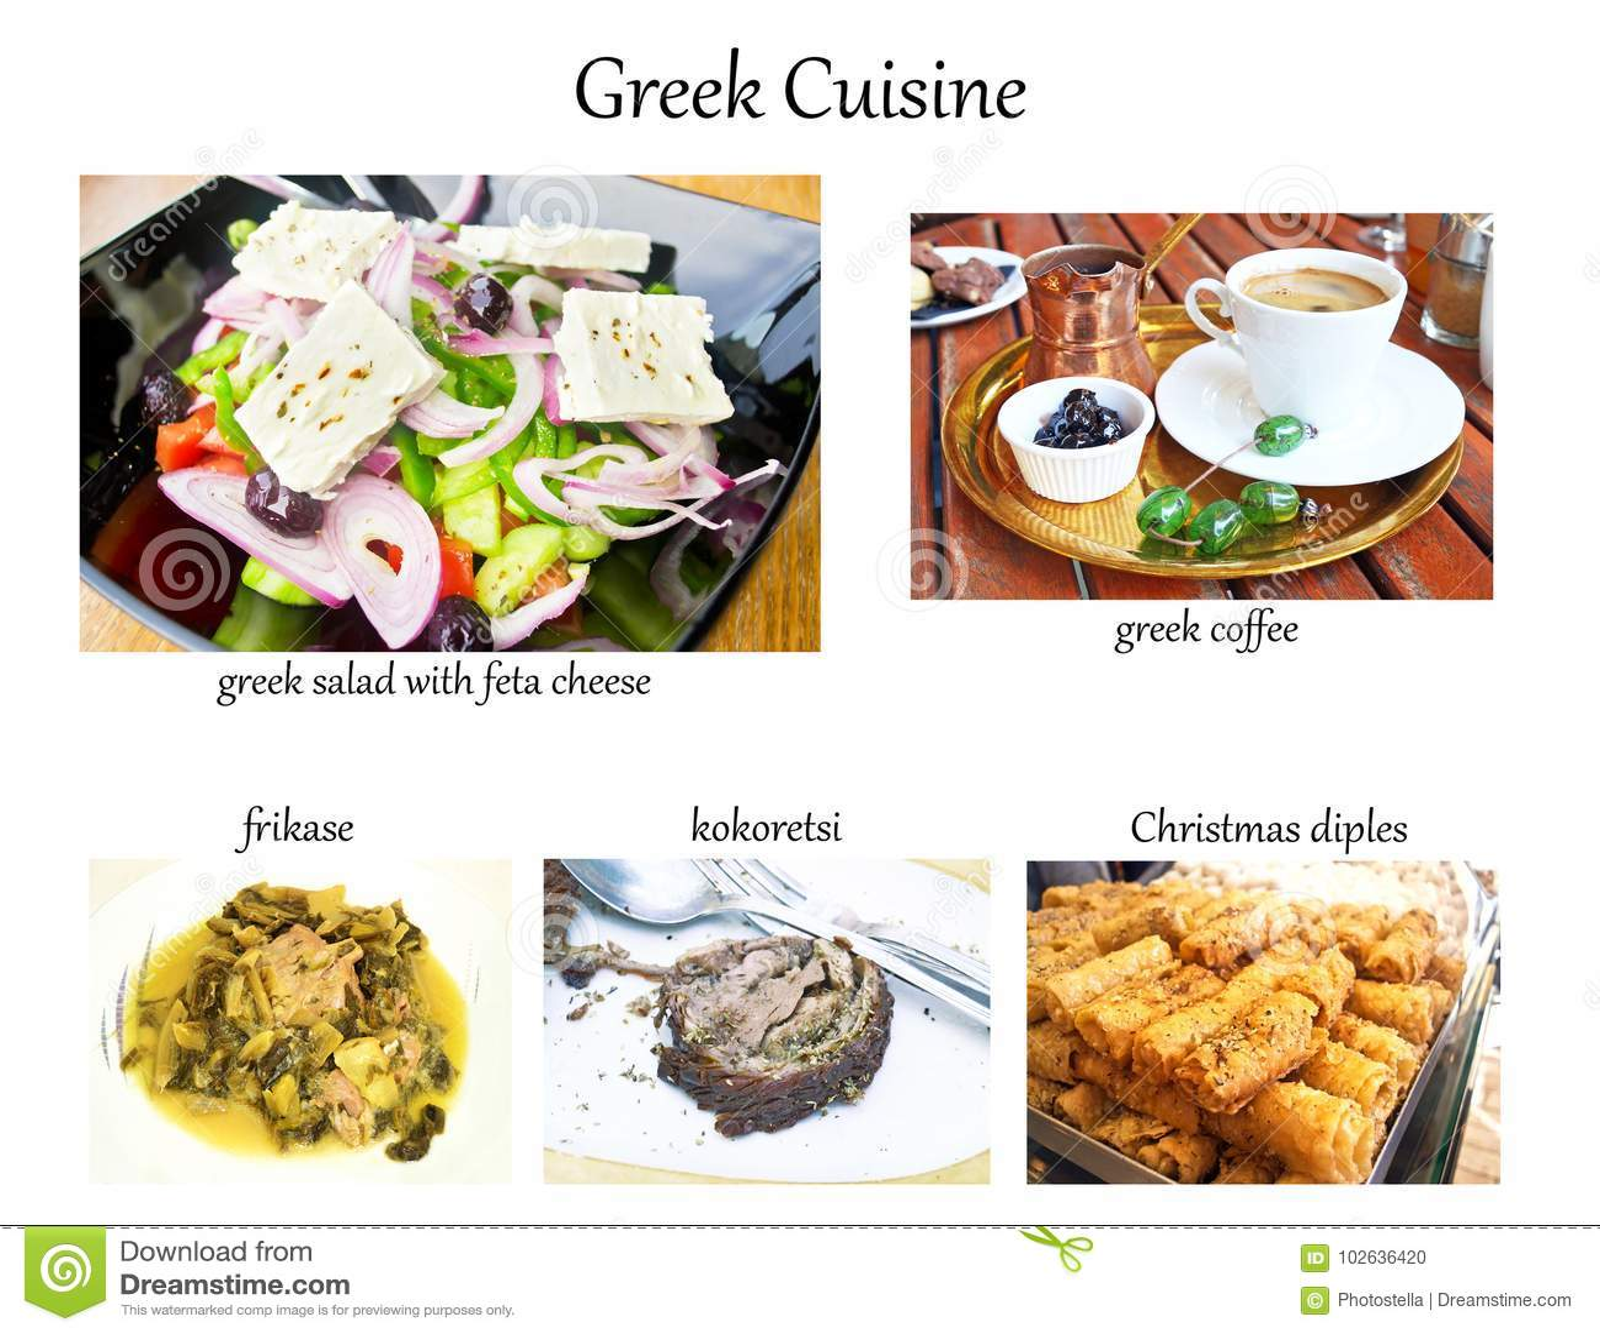 Collage with greek cuisine - coffee, salad, frikase, kokoretsi, christmas diples